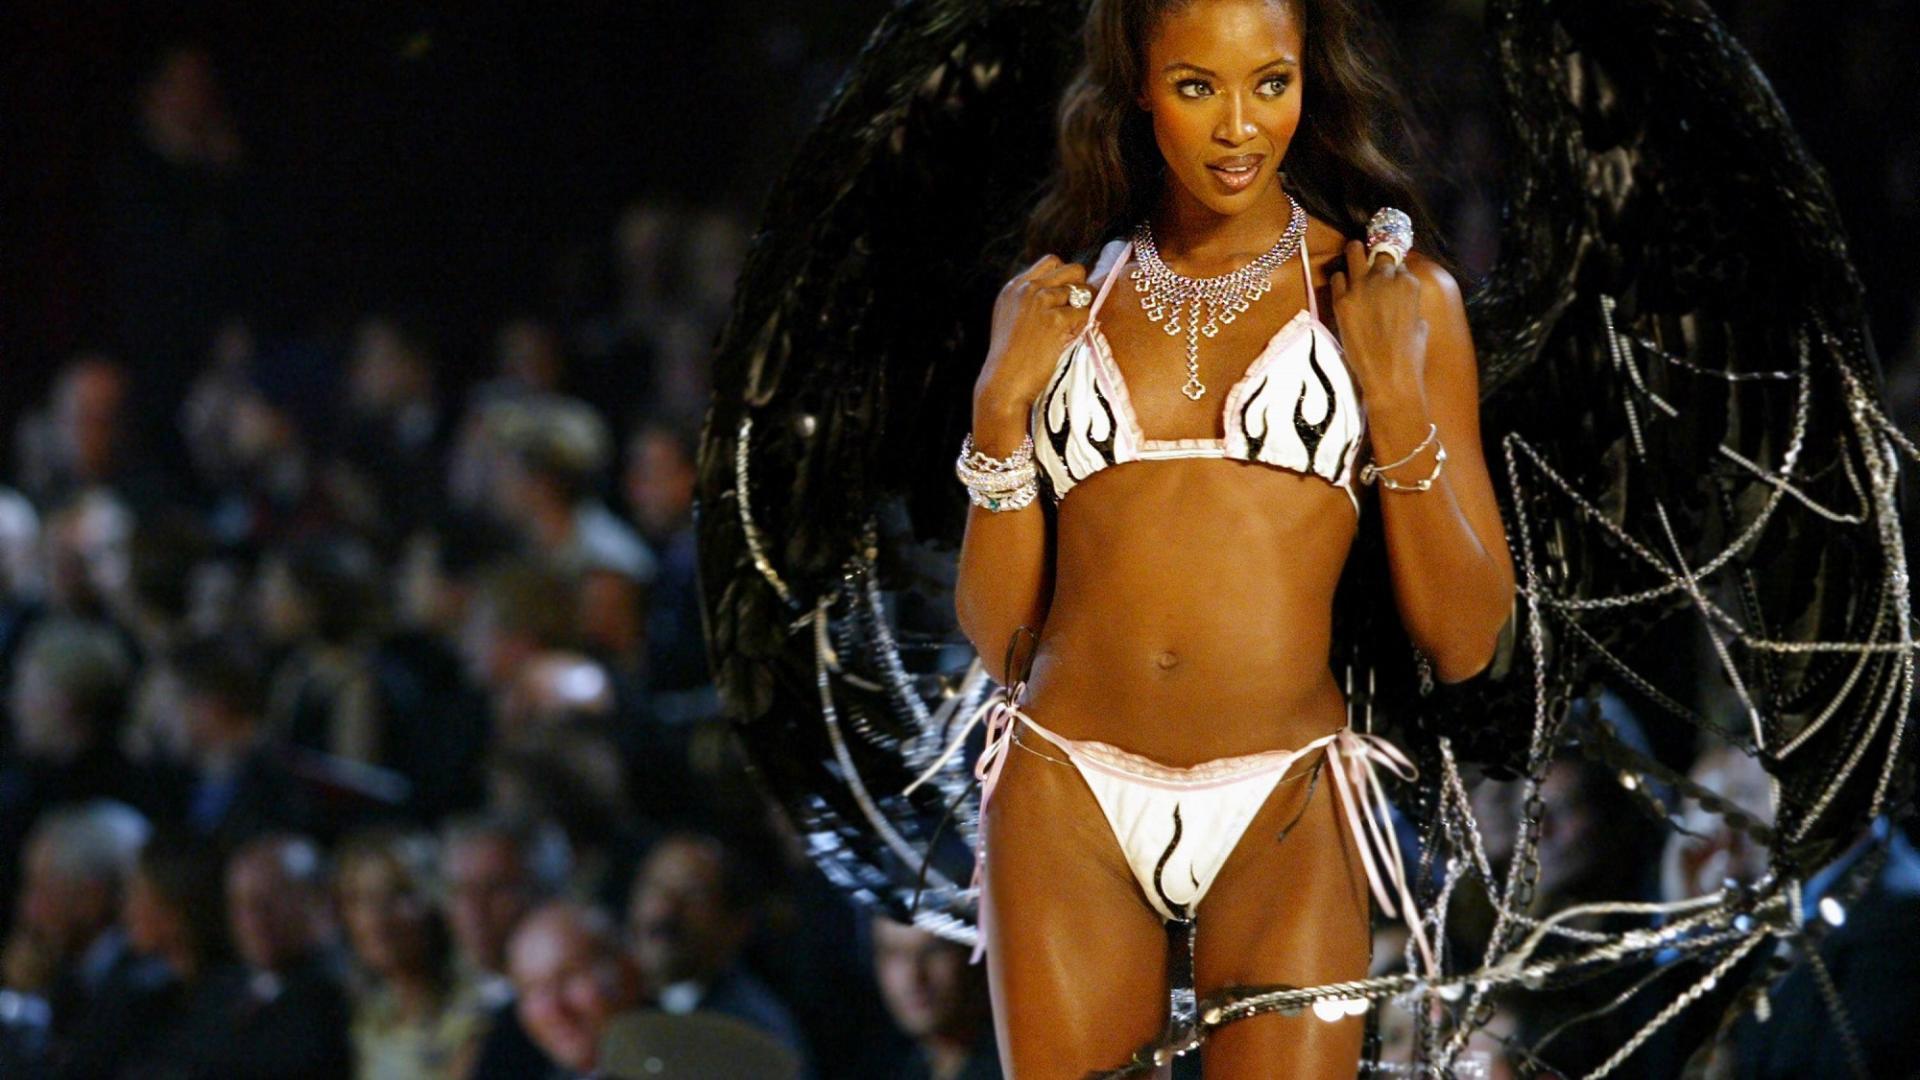 Model Naomi Campbell Victorias Secret Modenschau in New York